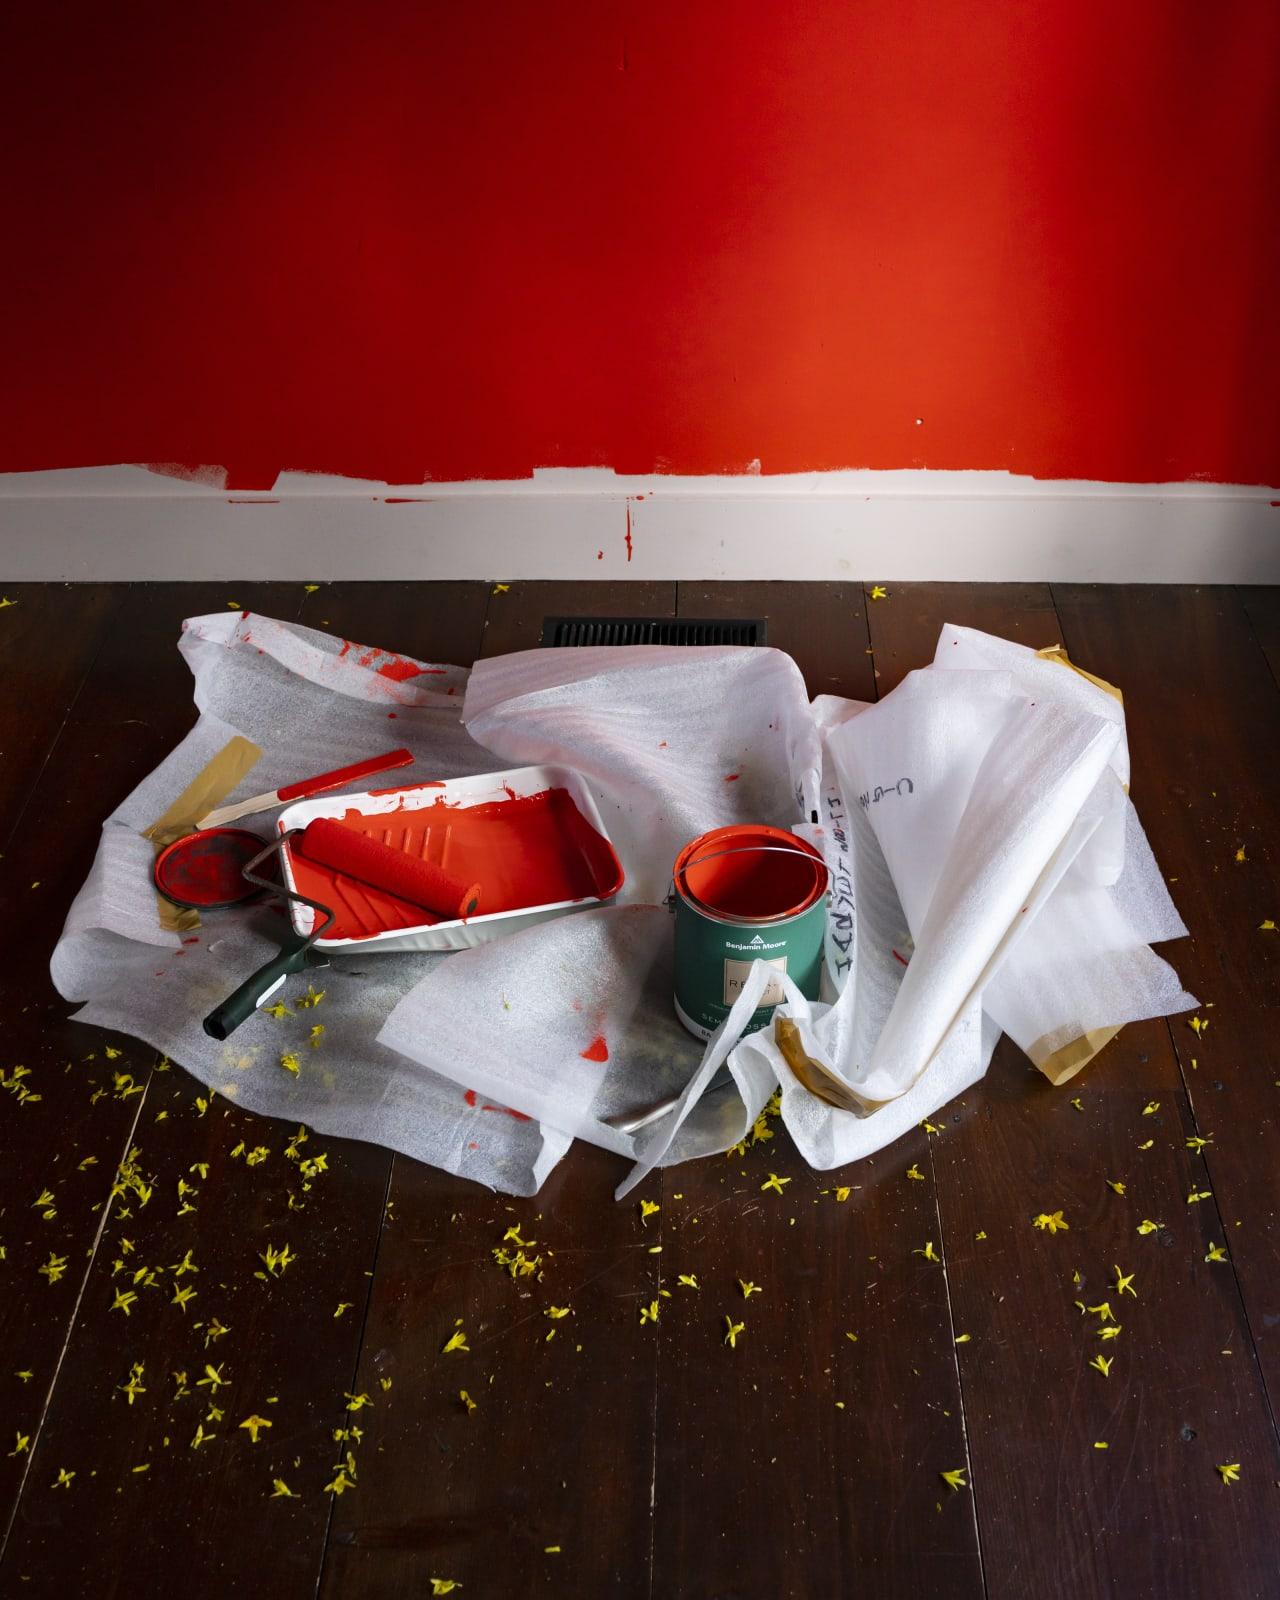 Cig Harvey, The Red Wall, 2020 20 x 16 inch chromogenic dye coupler print Edition of 10 40 x 30 inch chromogenic dye coupler print Edition of 7